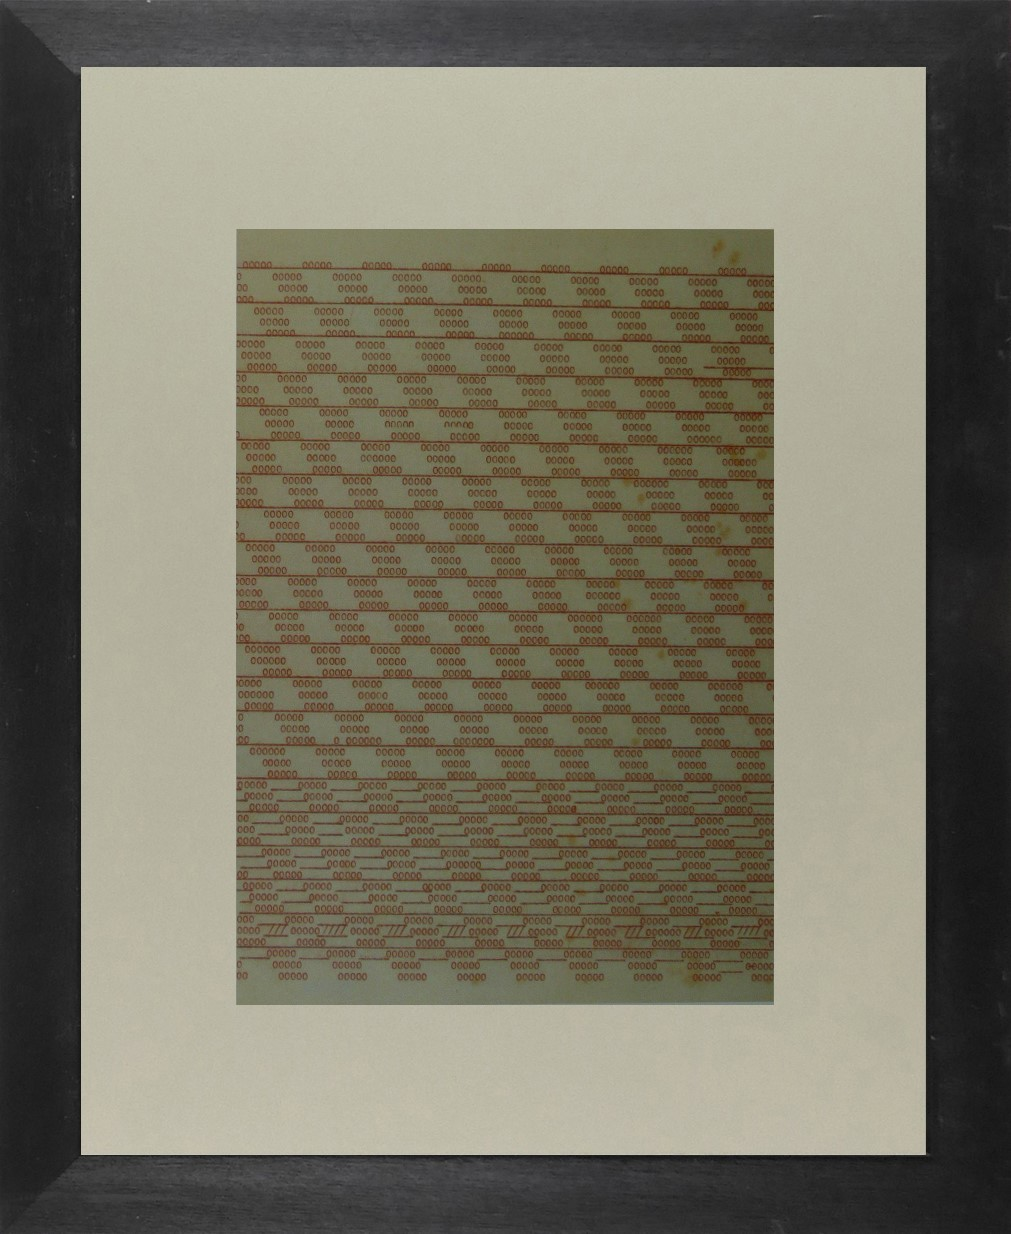 Zeros in red - (Bauhaus) - Framed Picture 11 x 14